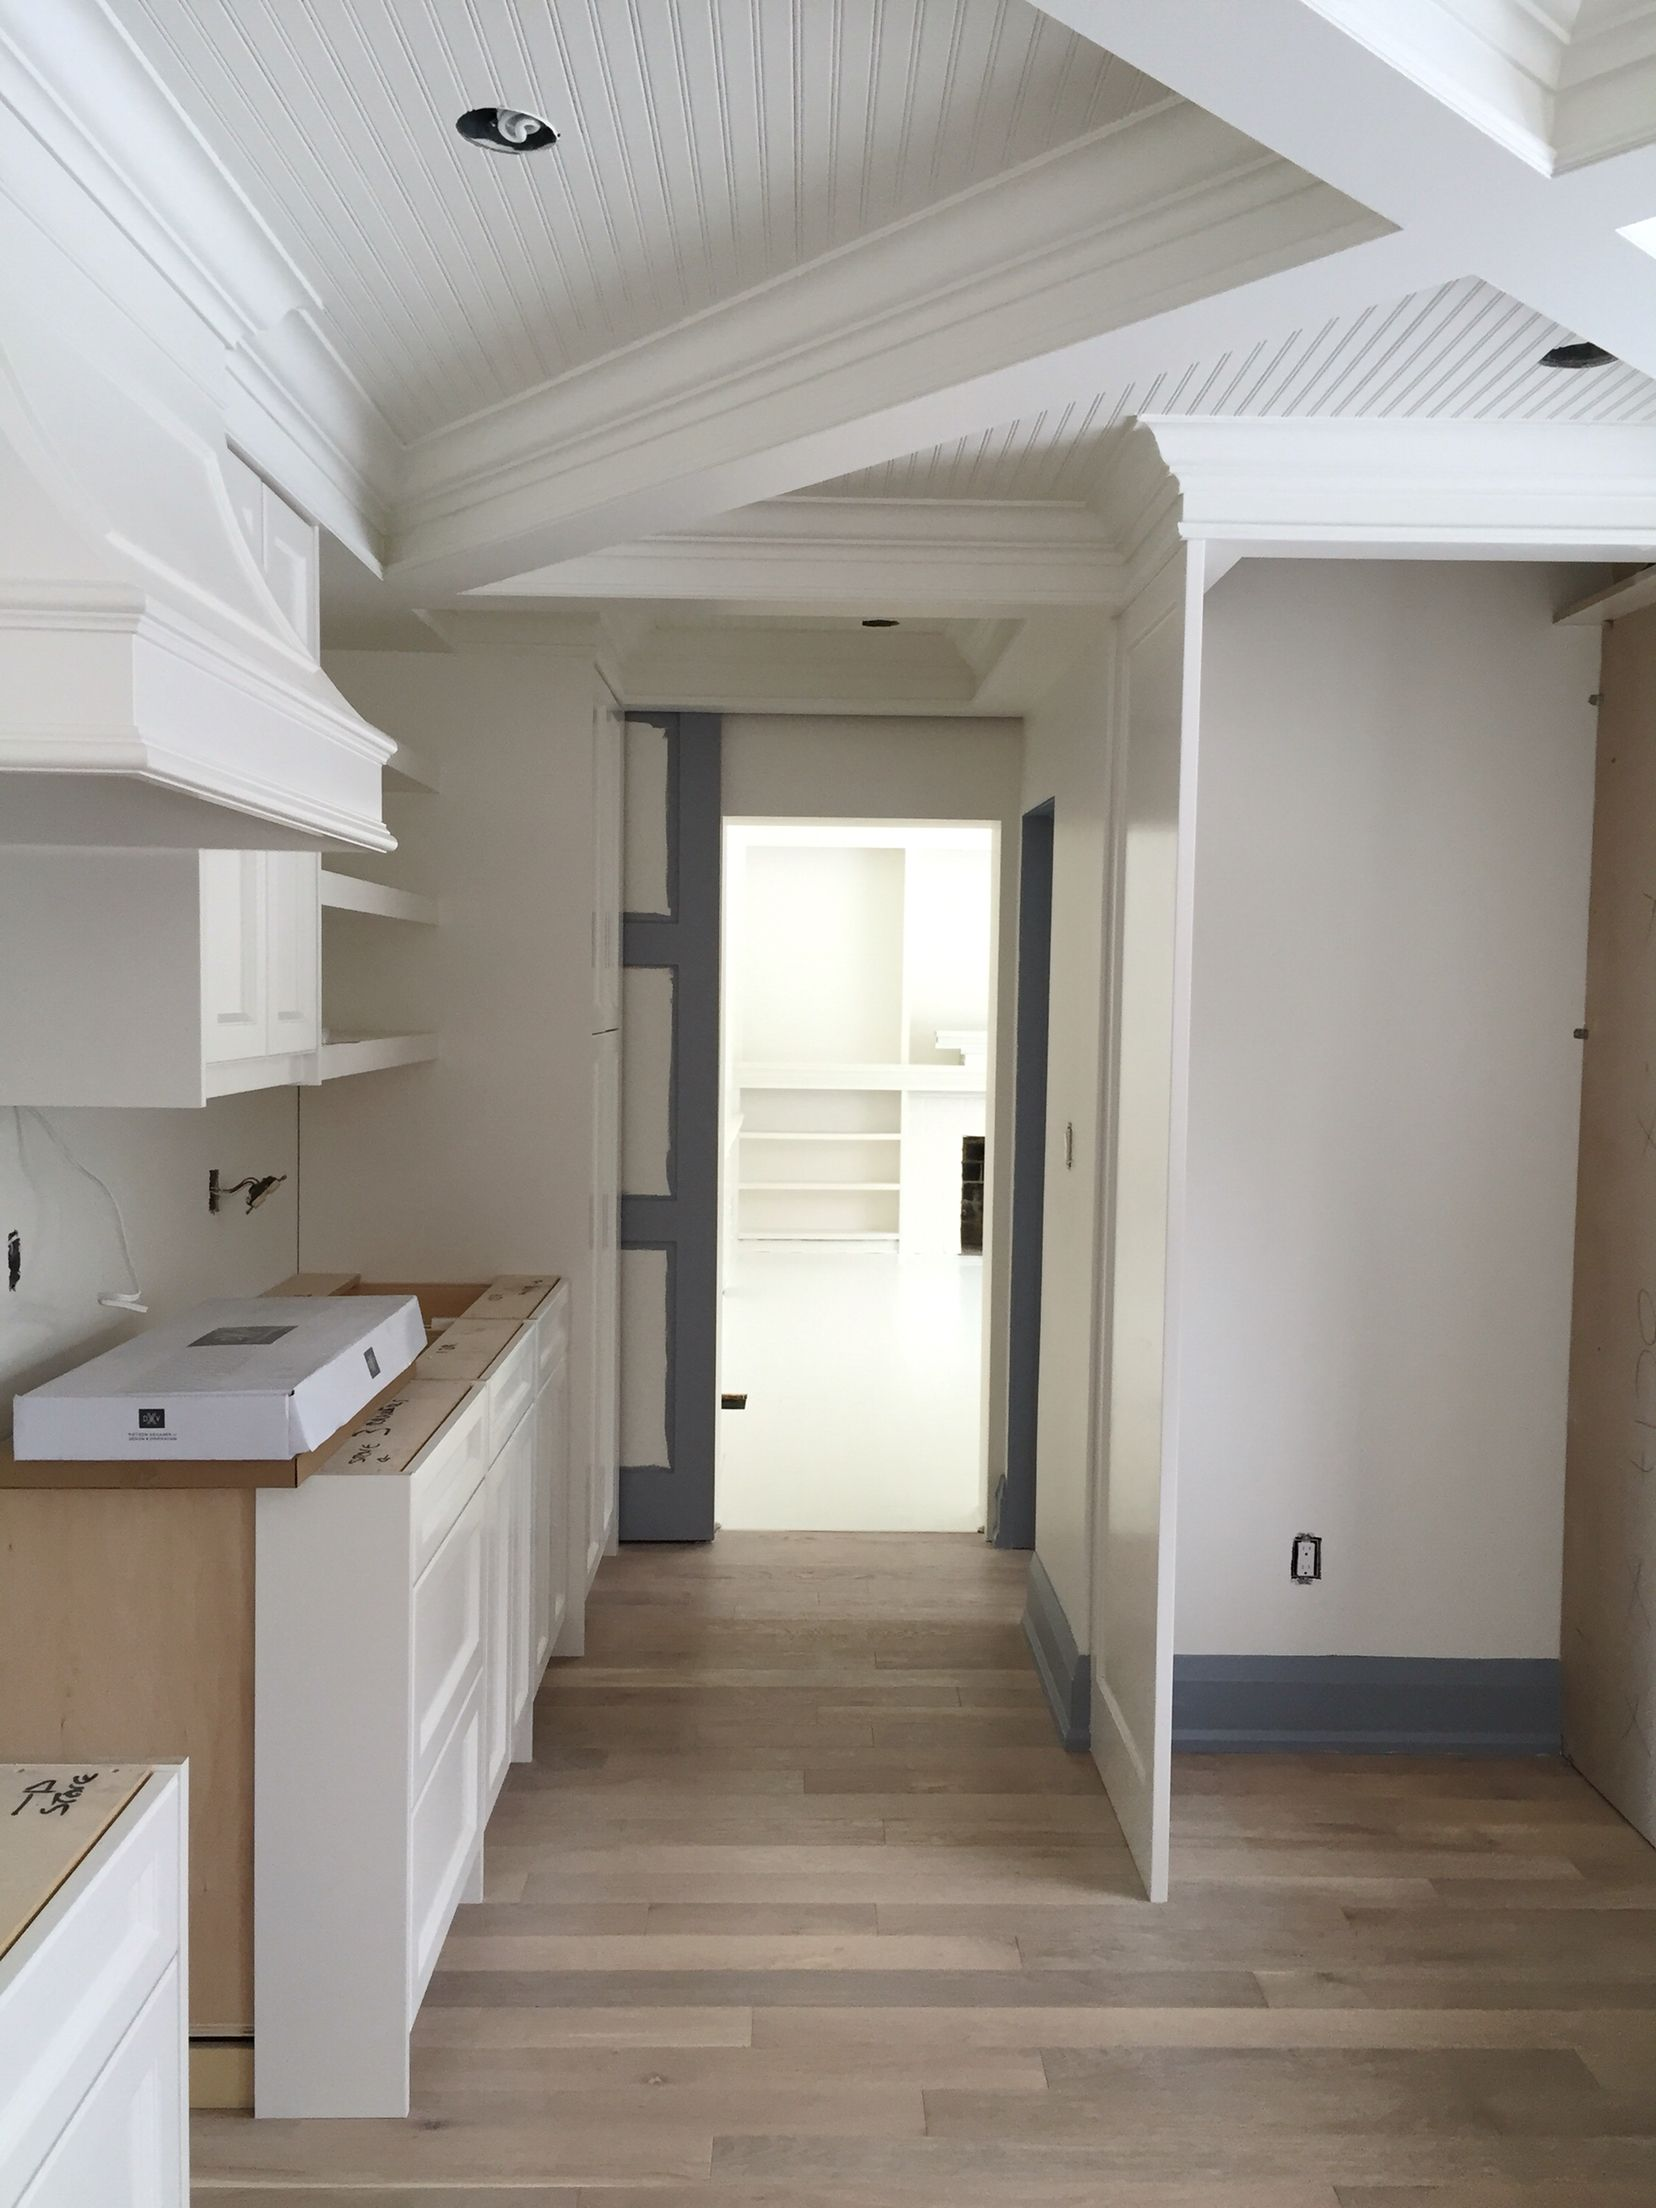 Penndr kitchen ceiling design by meredith heron design